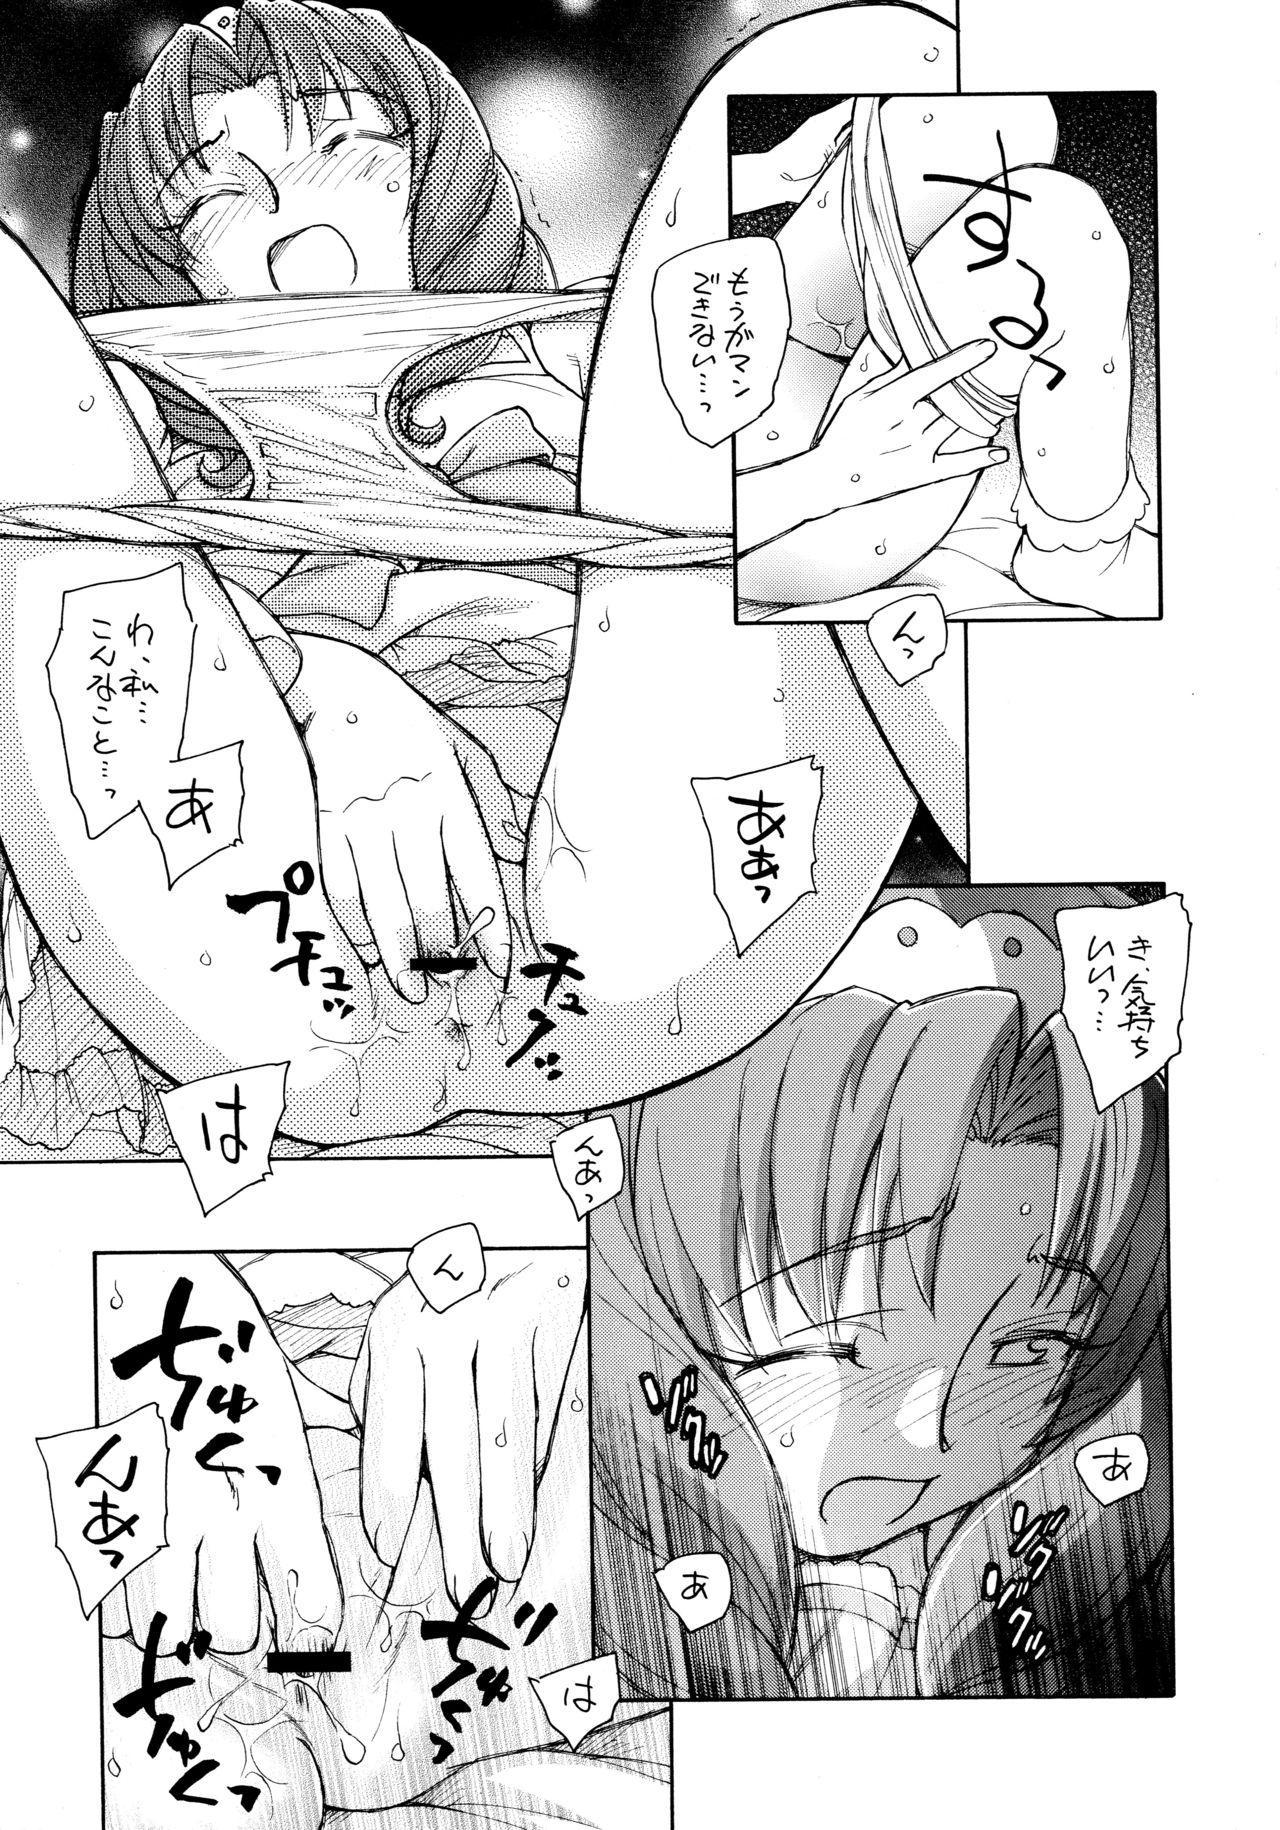 Kirakira Boshi Hensoukyoku 8